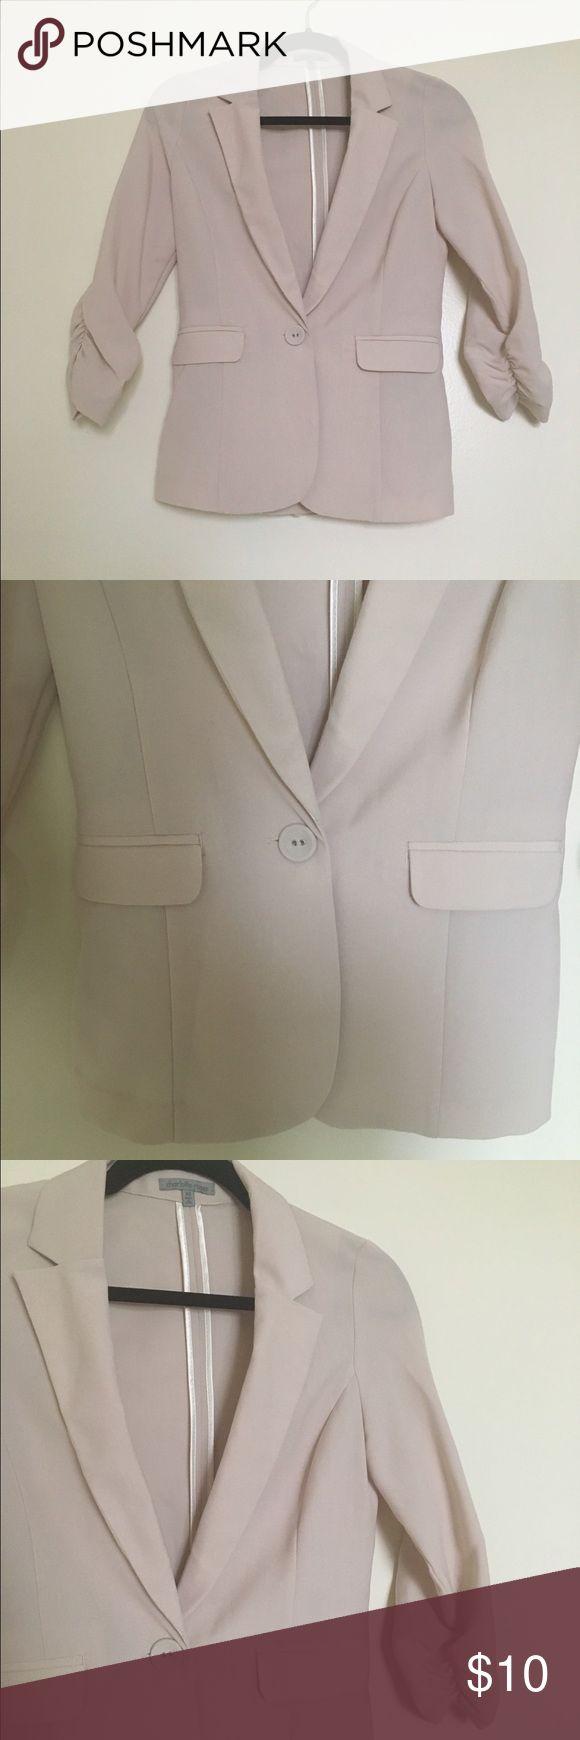 Light pink blazer One button, two pockets blazer. Charlotte Russe Jackets & Coats Blazers